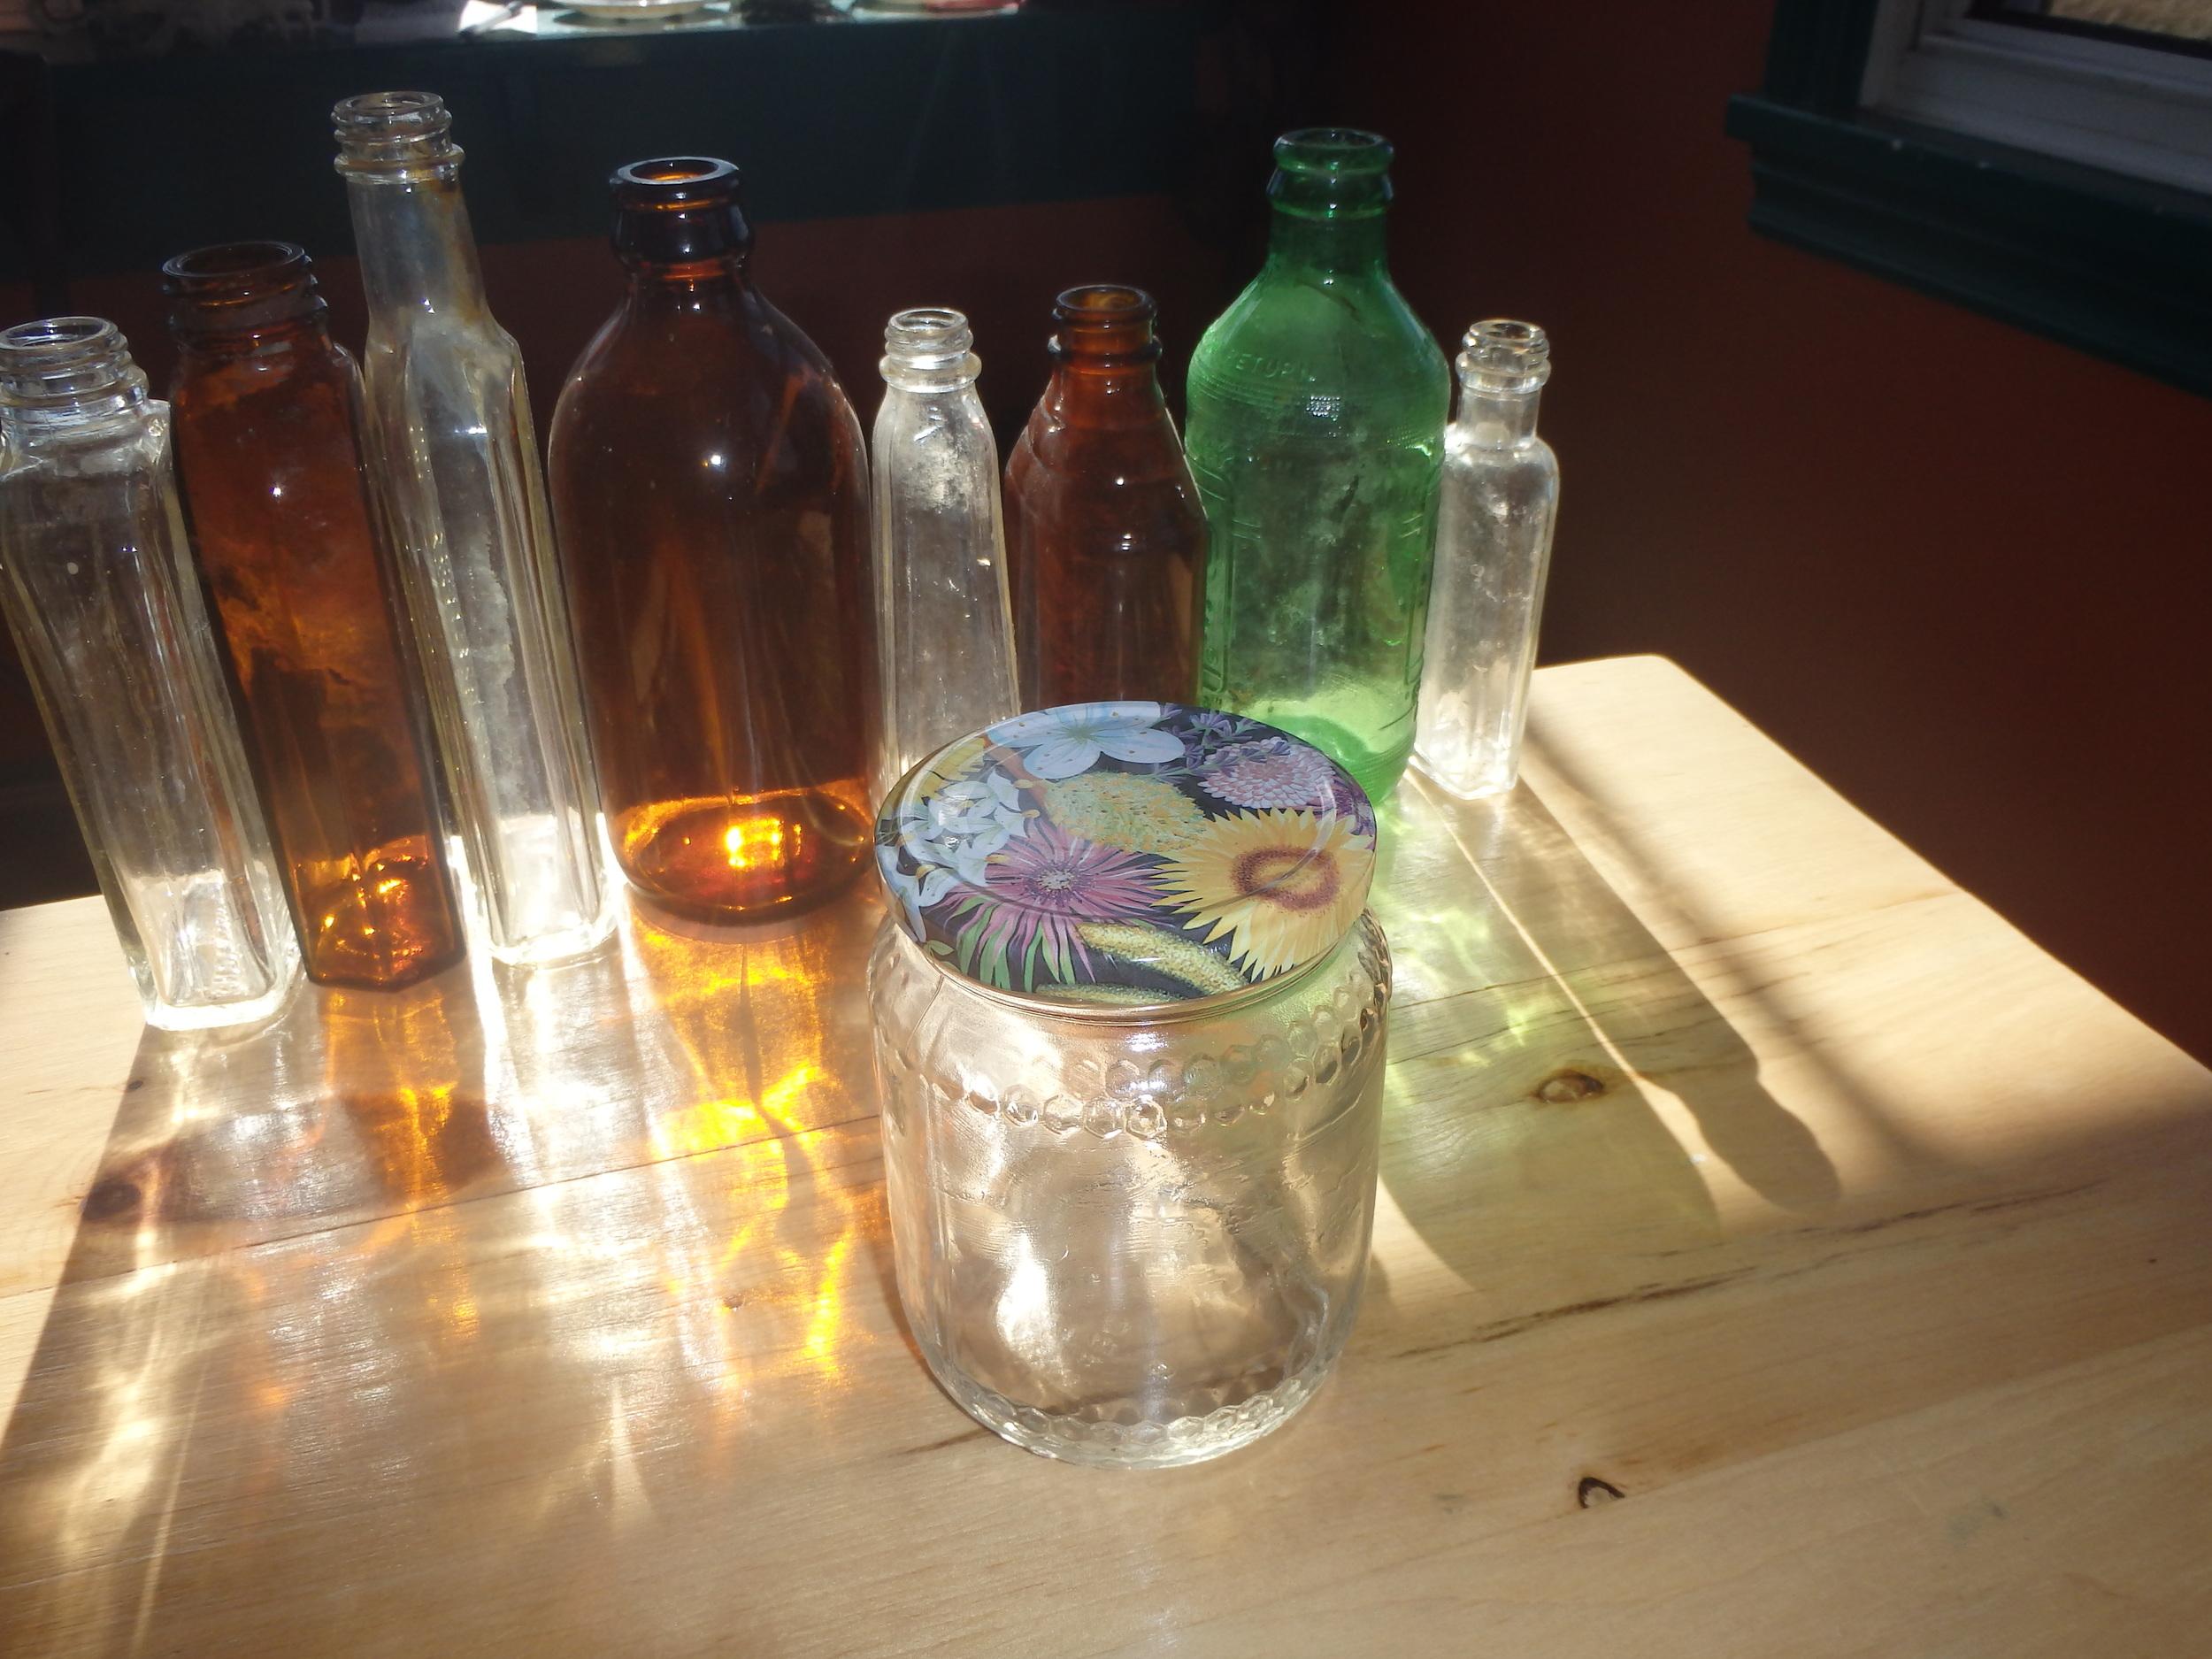 Reuse glass jars for creams.